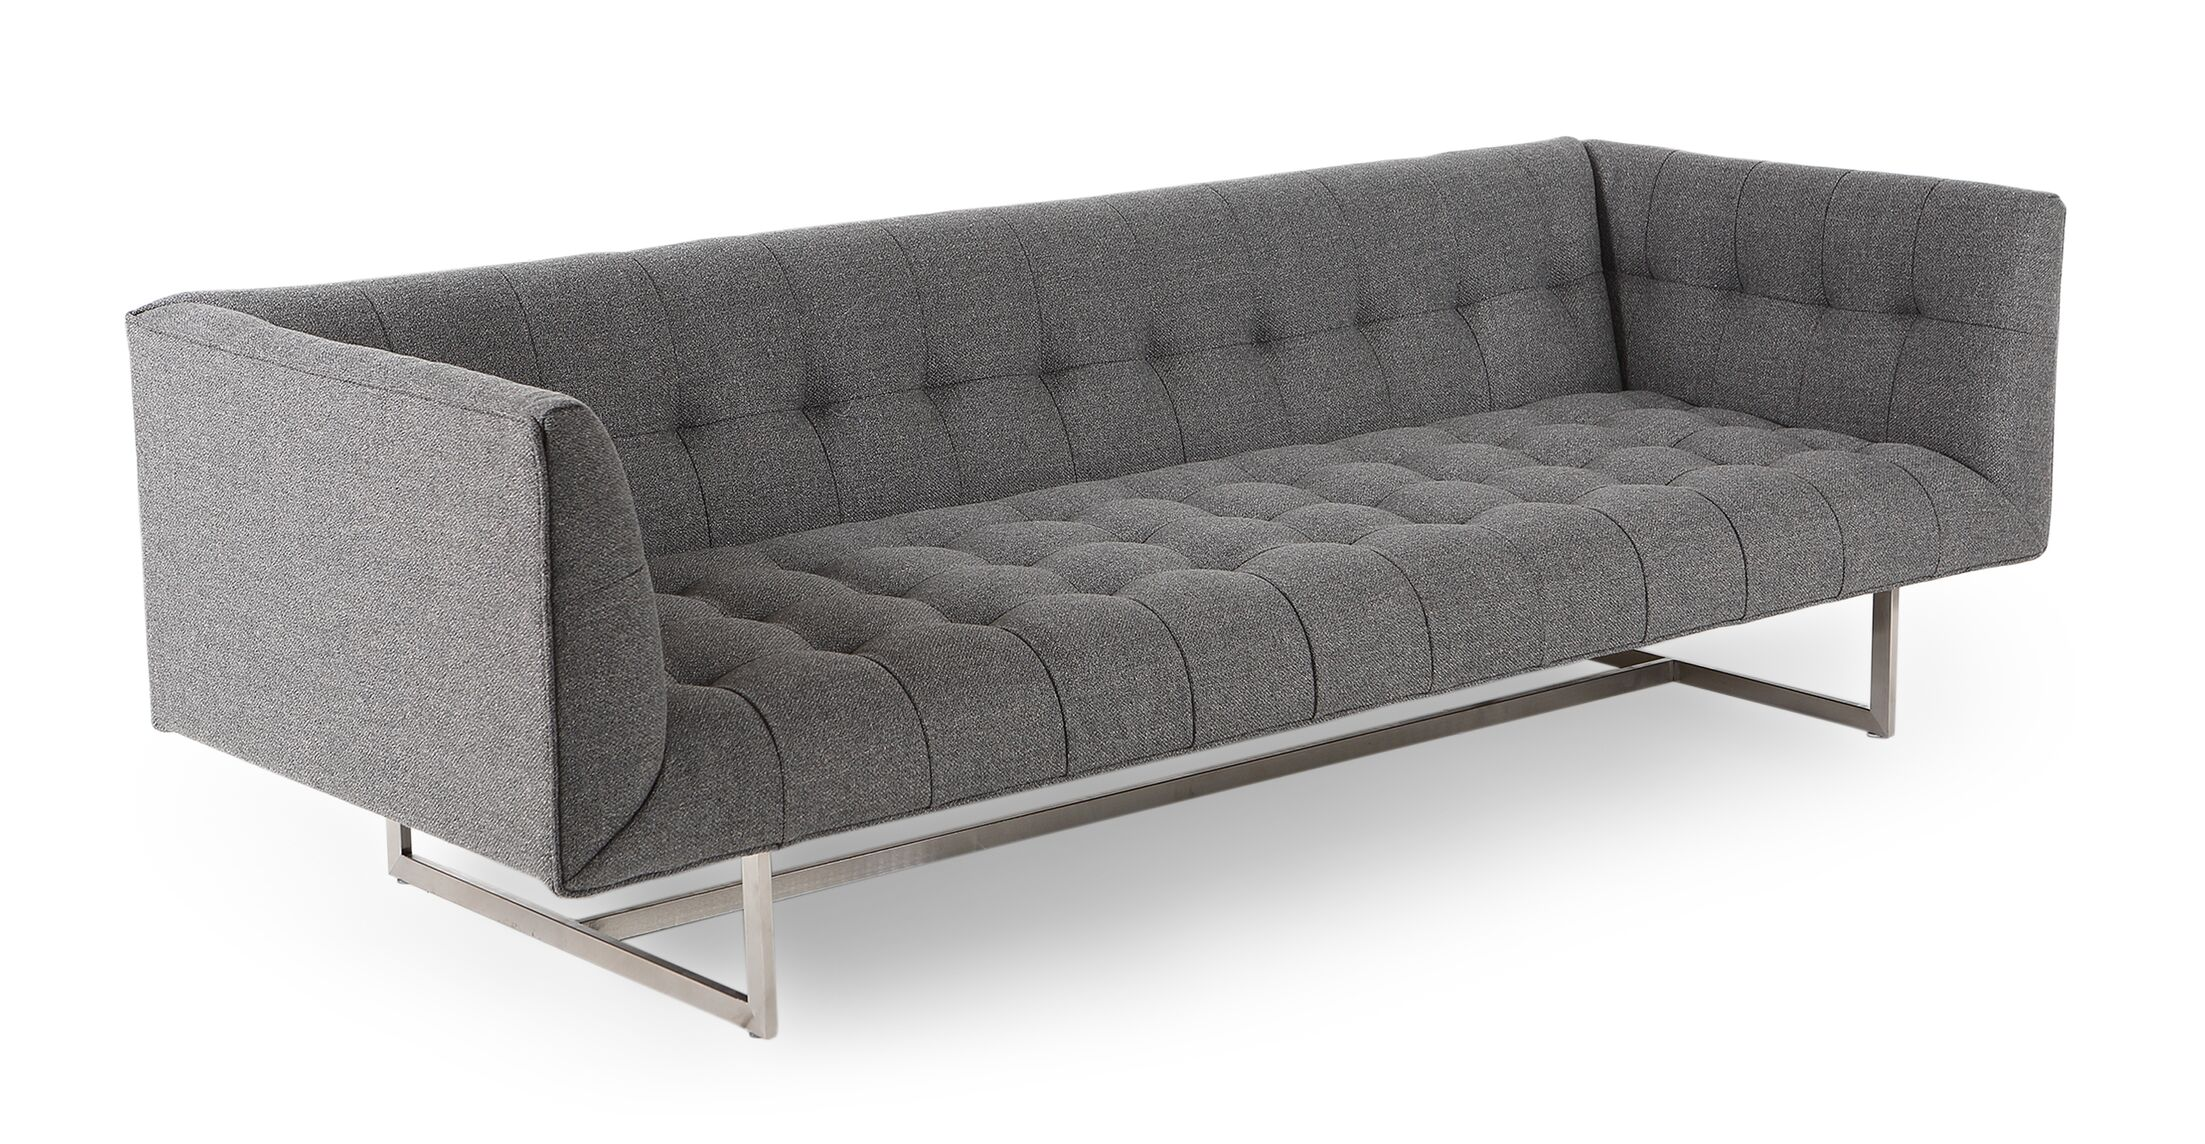 Shaner Sofa Body Fabric: Varsity Gray Twill